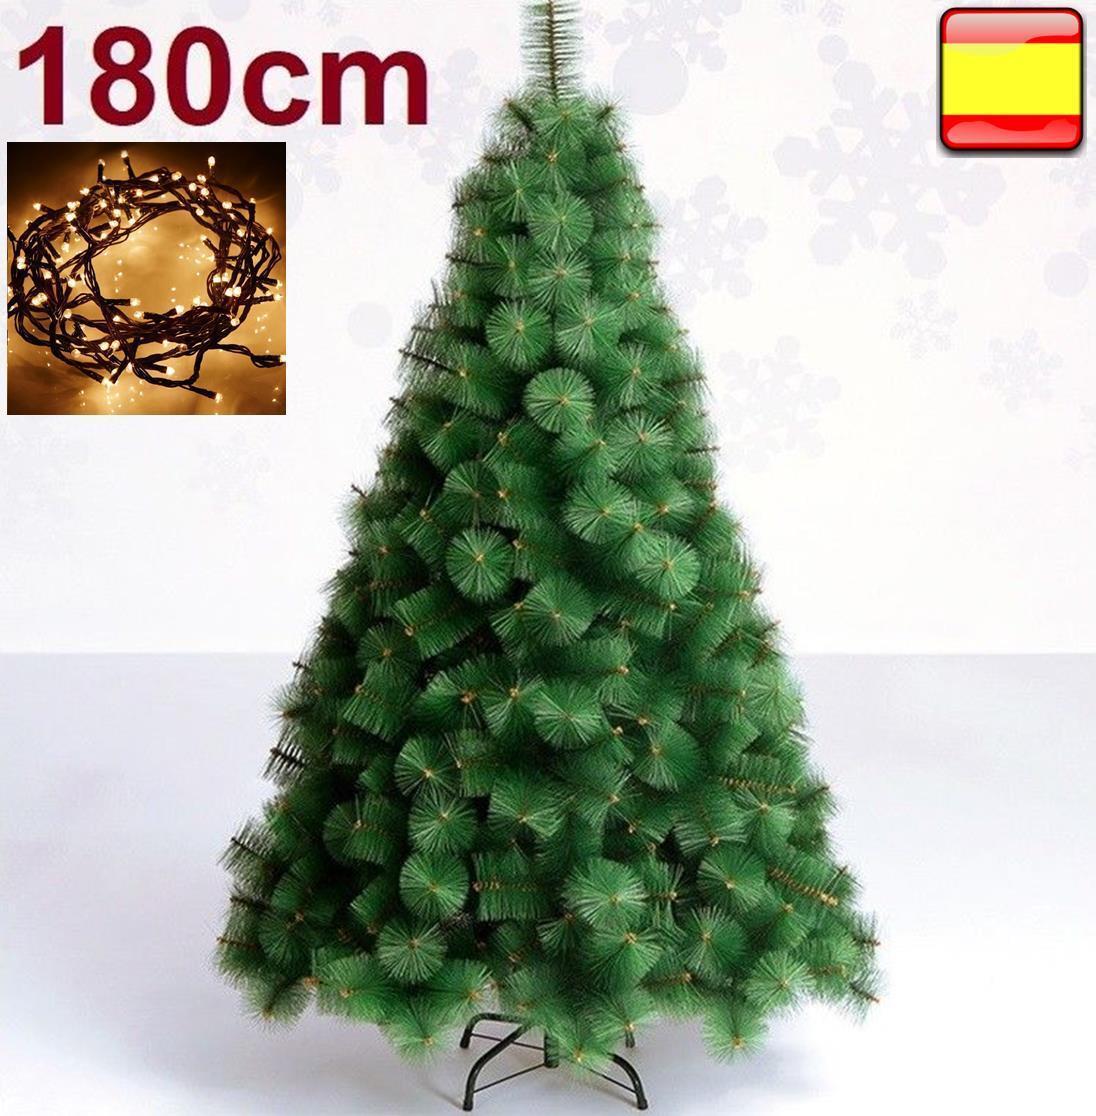 Arbol de navidad pino verde 1,80m metros 180cm + luz led 100...